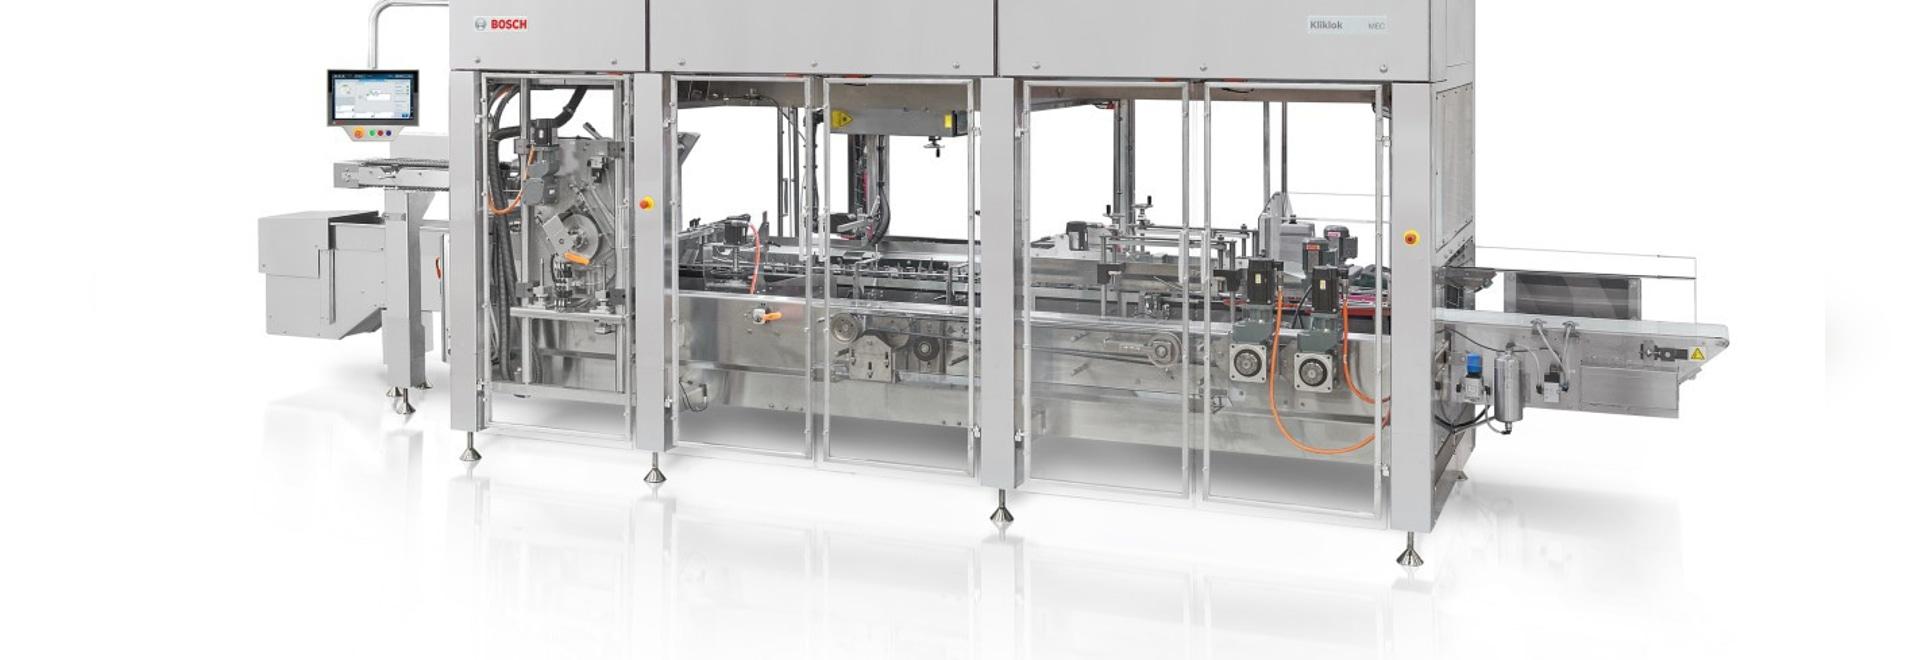 Bosch Packaging: Bag-in-box handling system